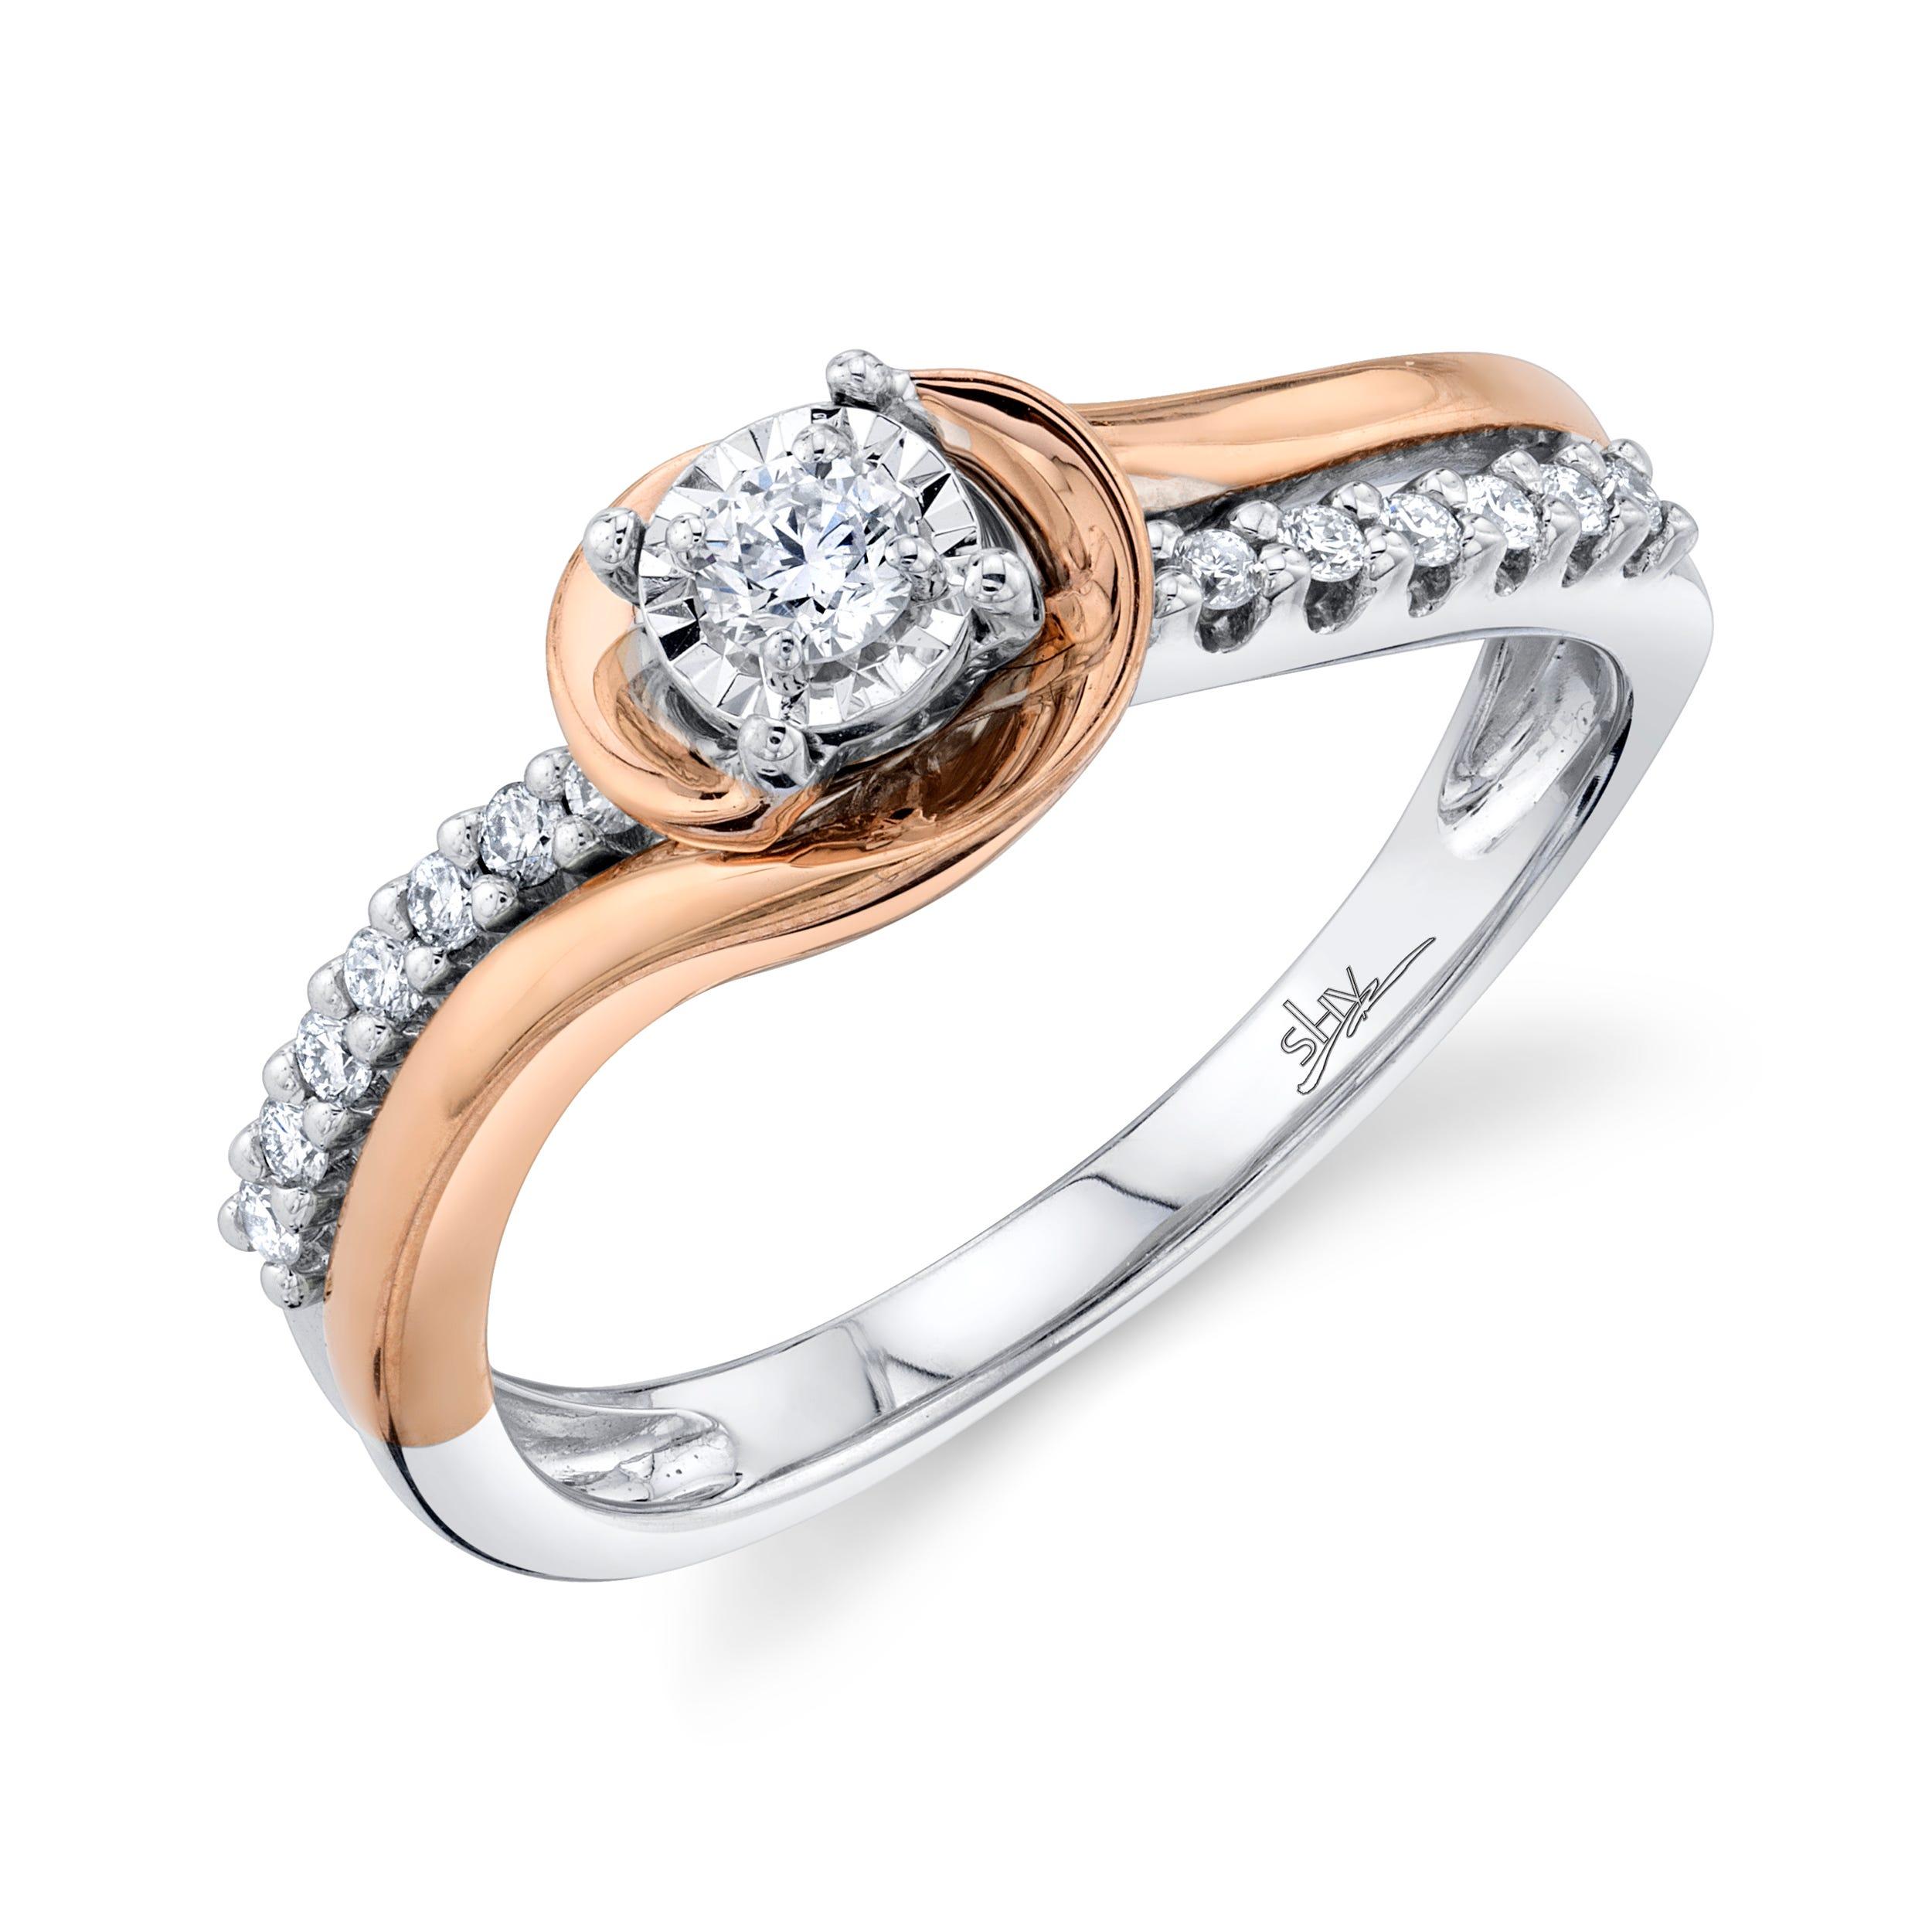 Shy Creation 1/4ctw. Diamond Swirl Engagement Ring in 14k White & Rose Gold SC22007095